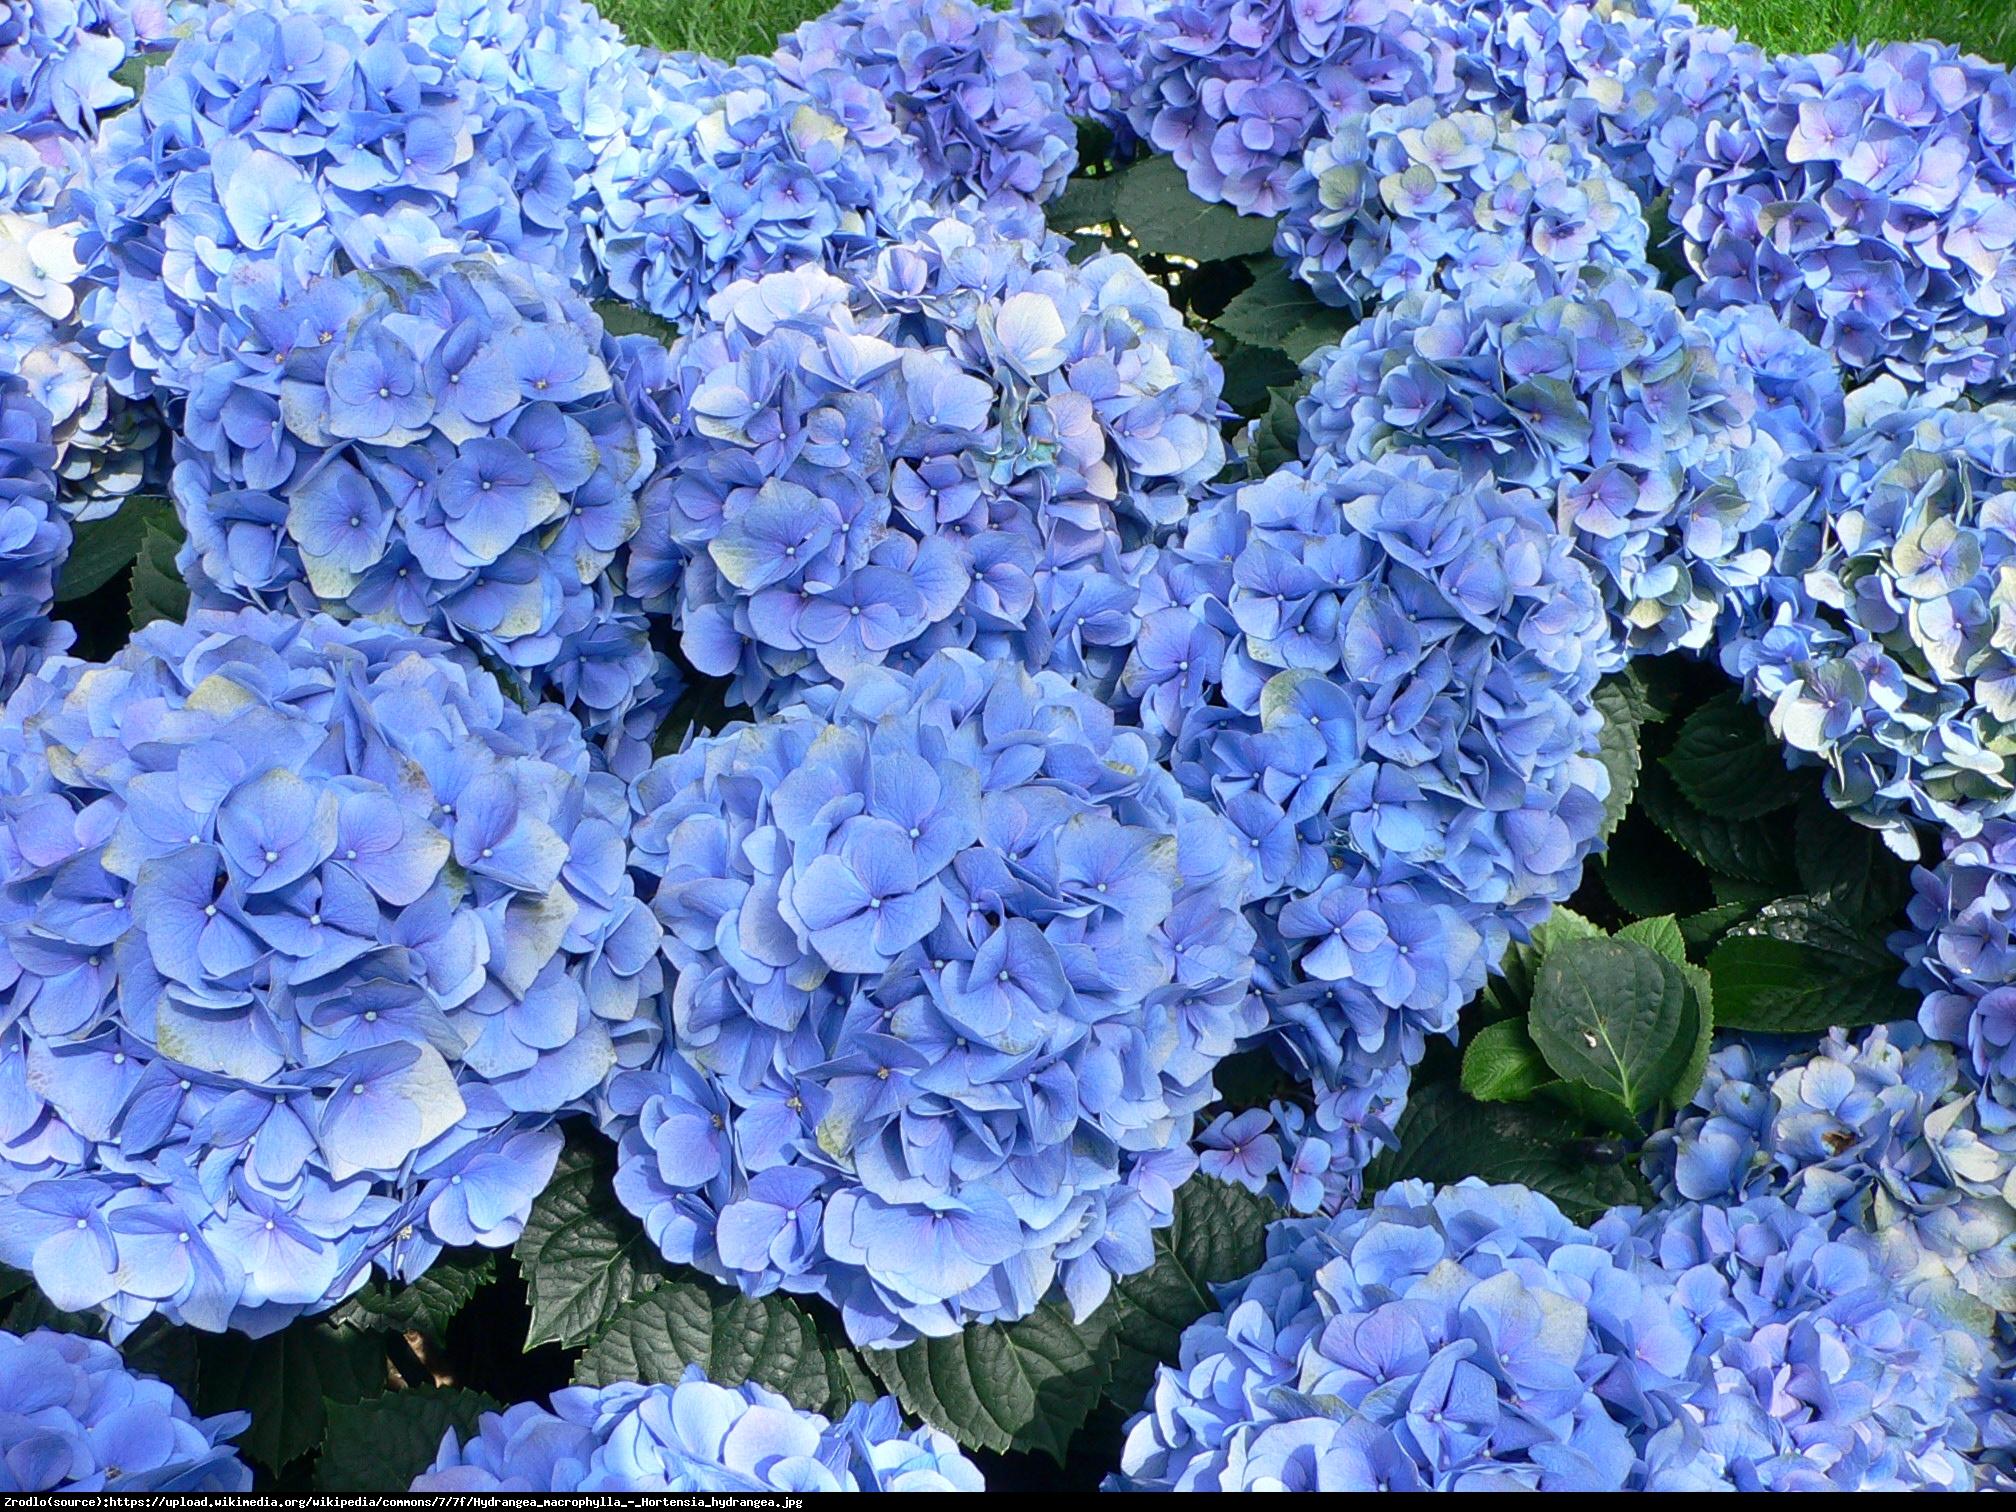 Hortensja ogrodowa Baby Blue - Hydrangea macrophylla Baby Blue